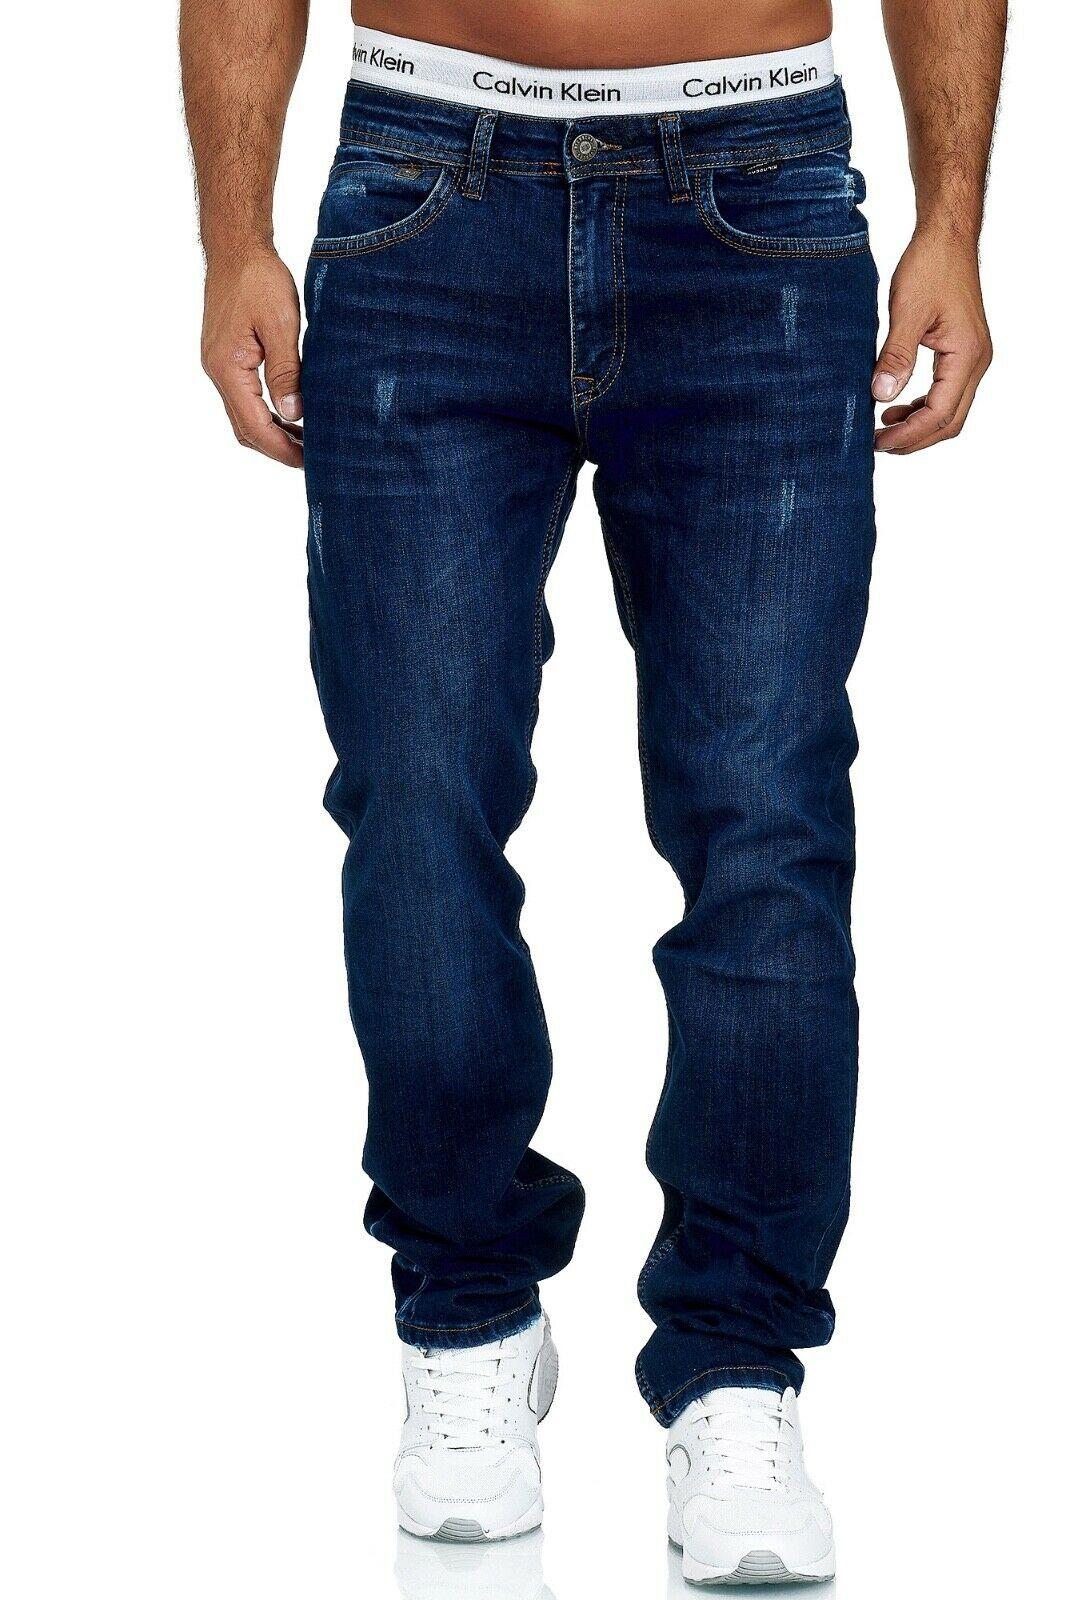 Herren-Jeans-Hose-Denim-KC-Black-Washed-Straight-Cut-Regular-Dicke-Naht-naehte Indexbild 66